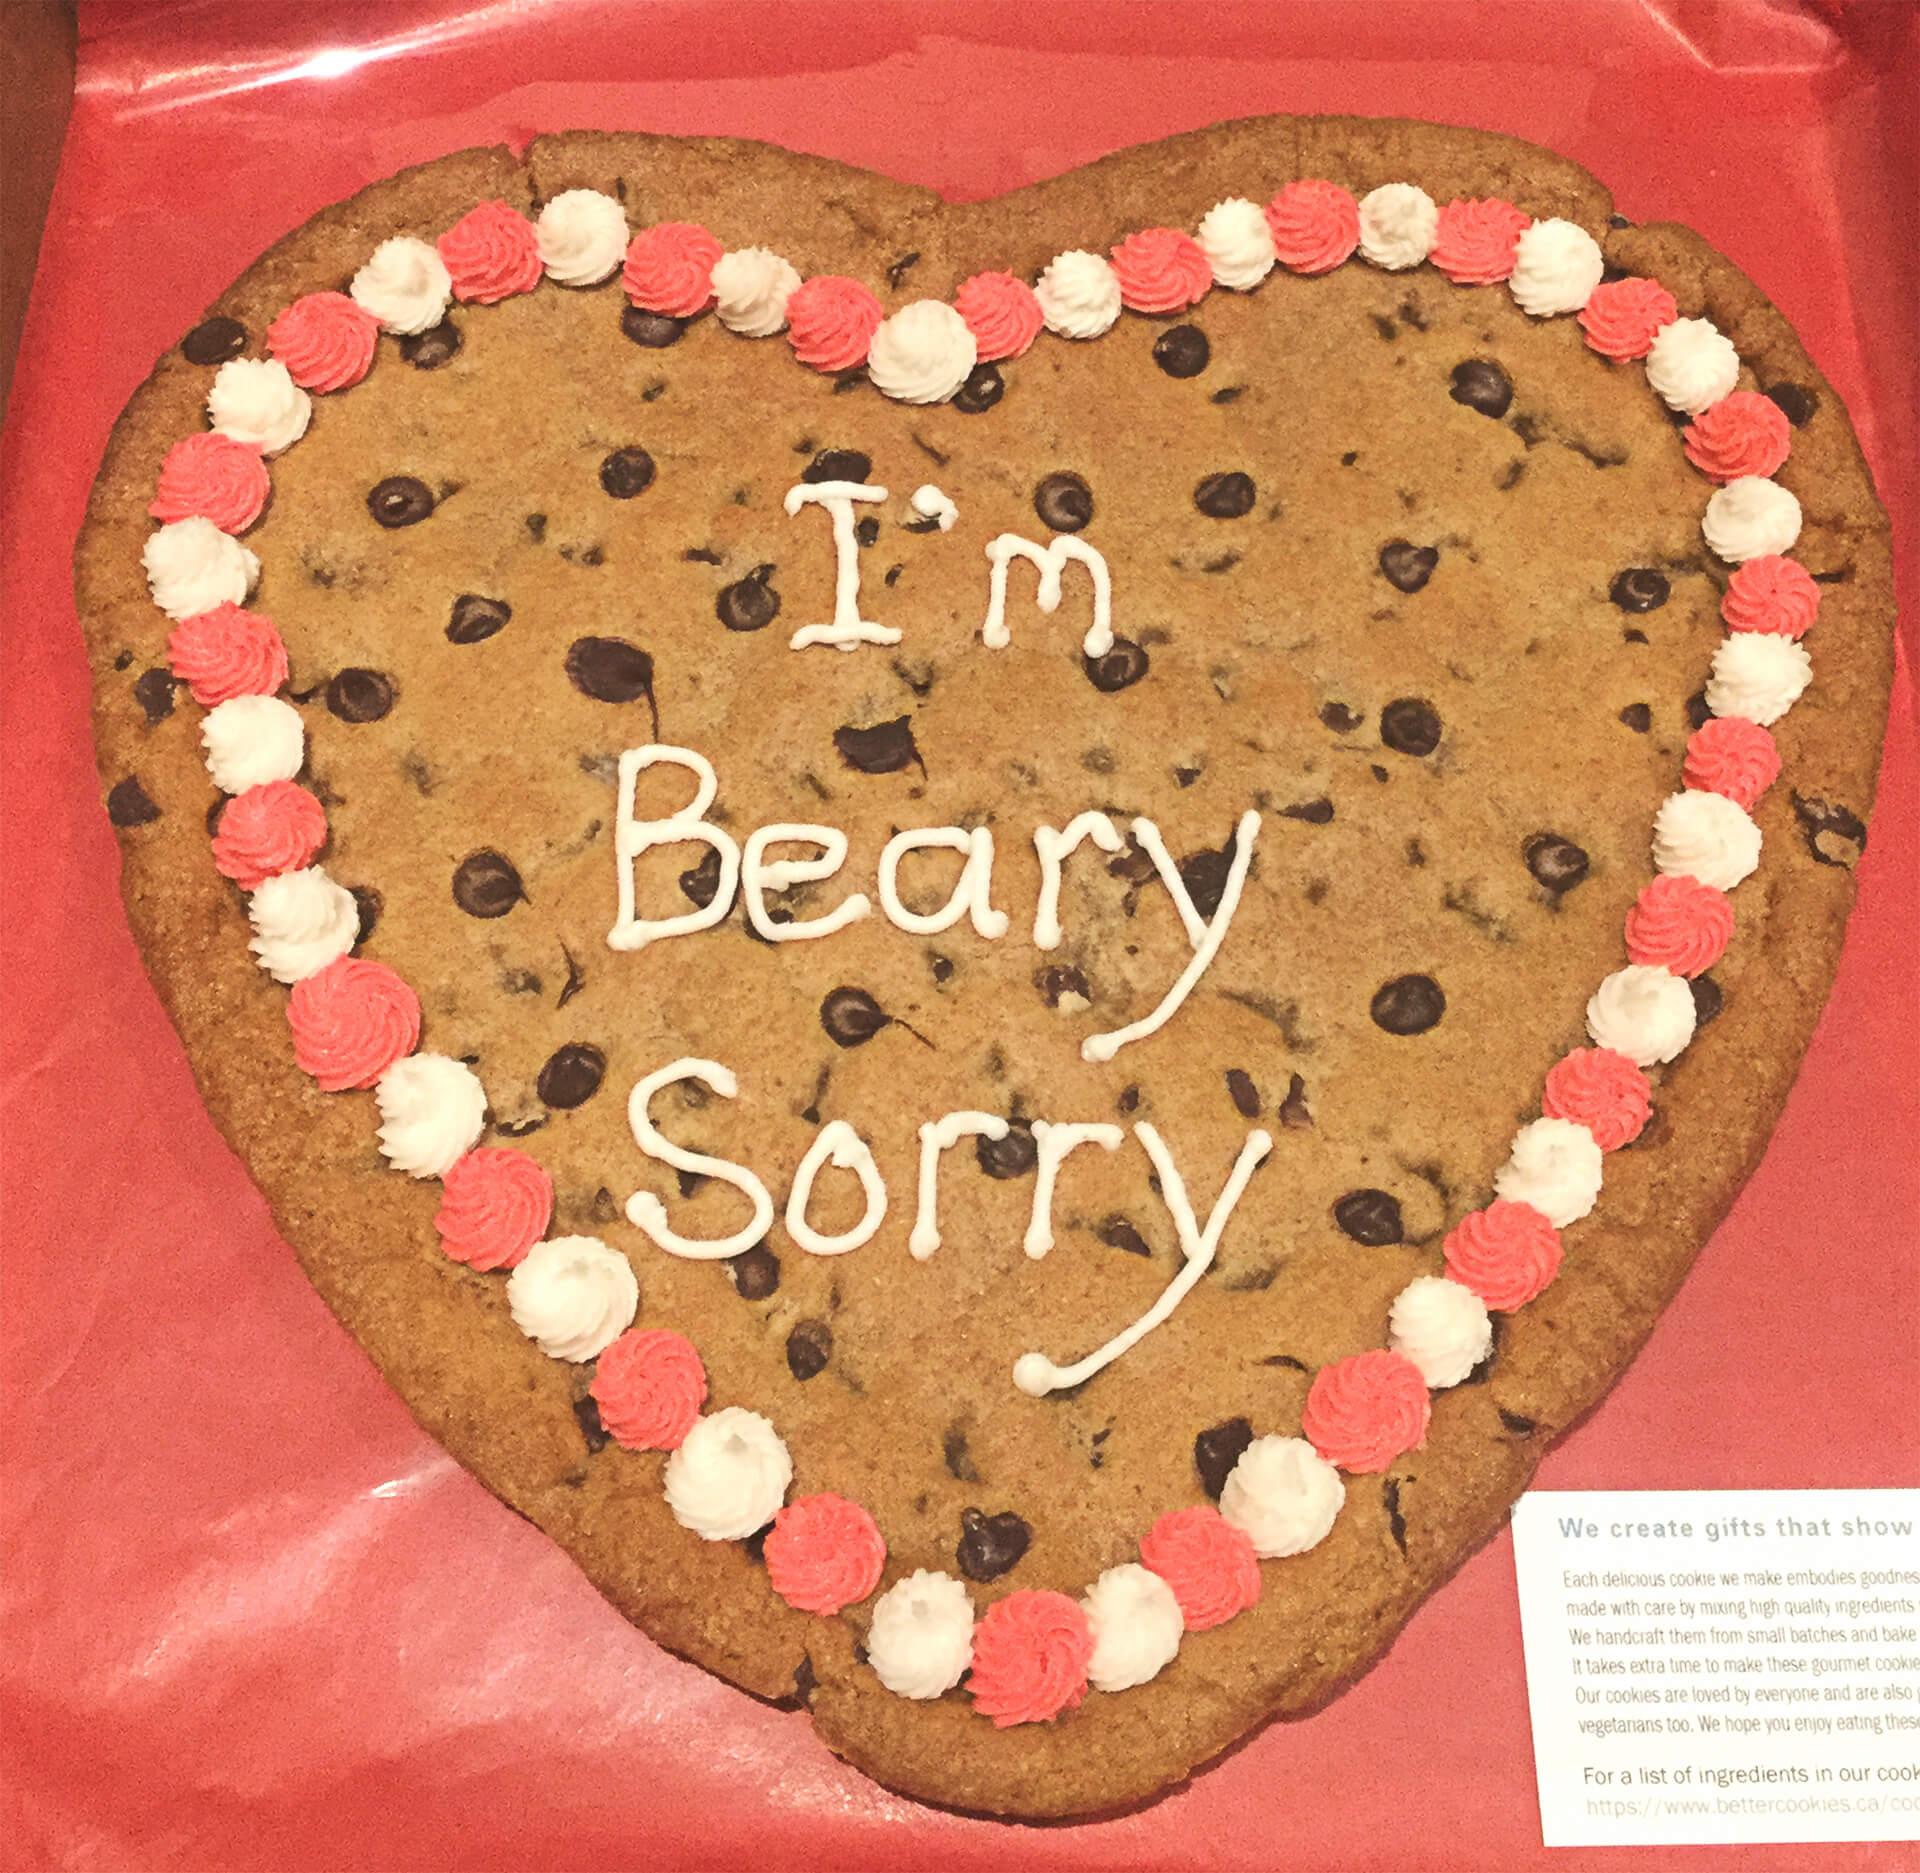 I'm Sorry Cookie gram